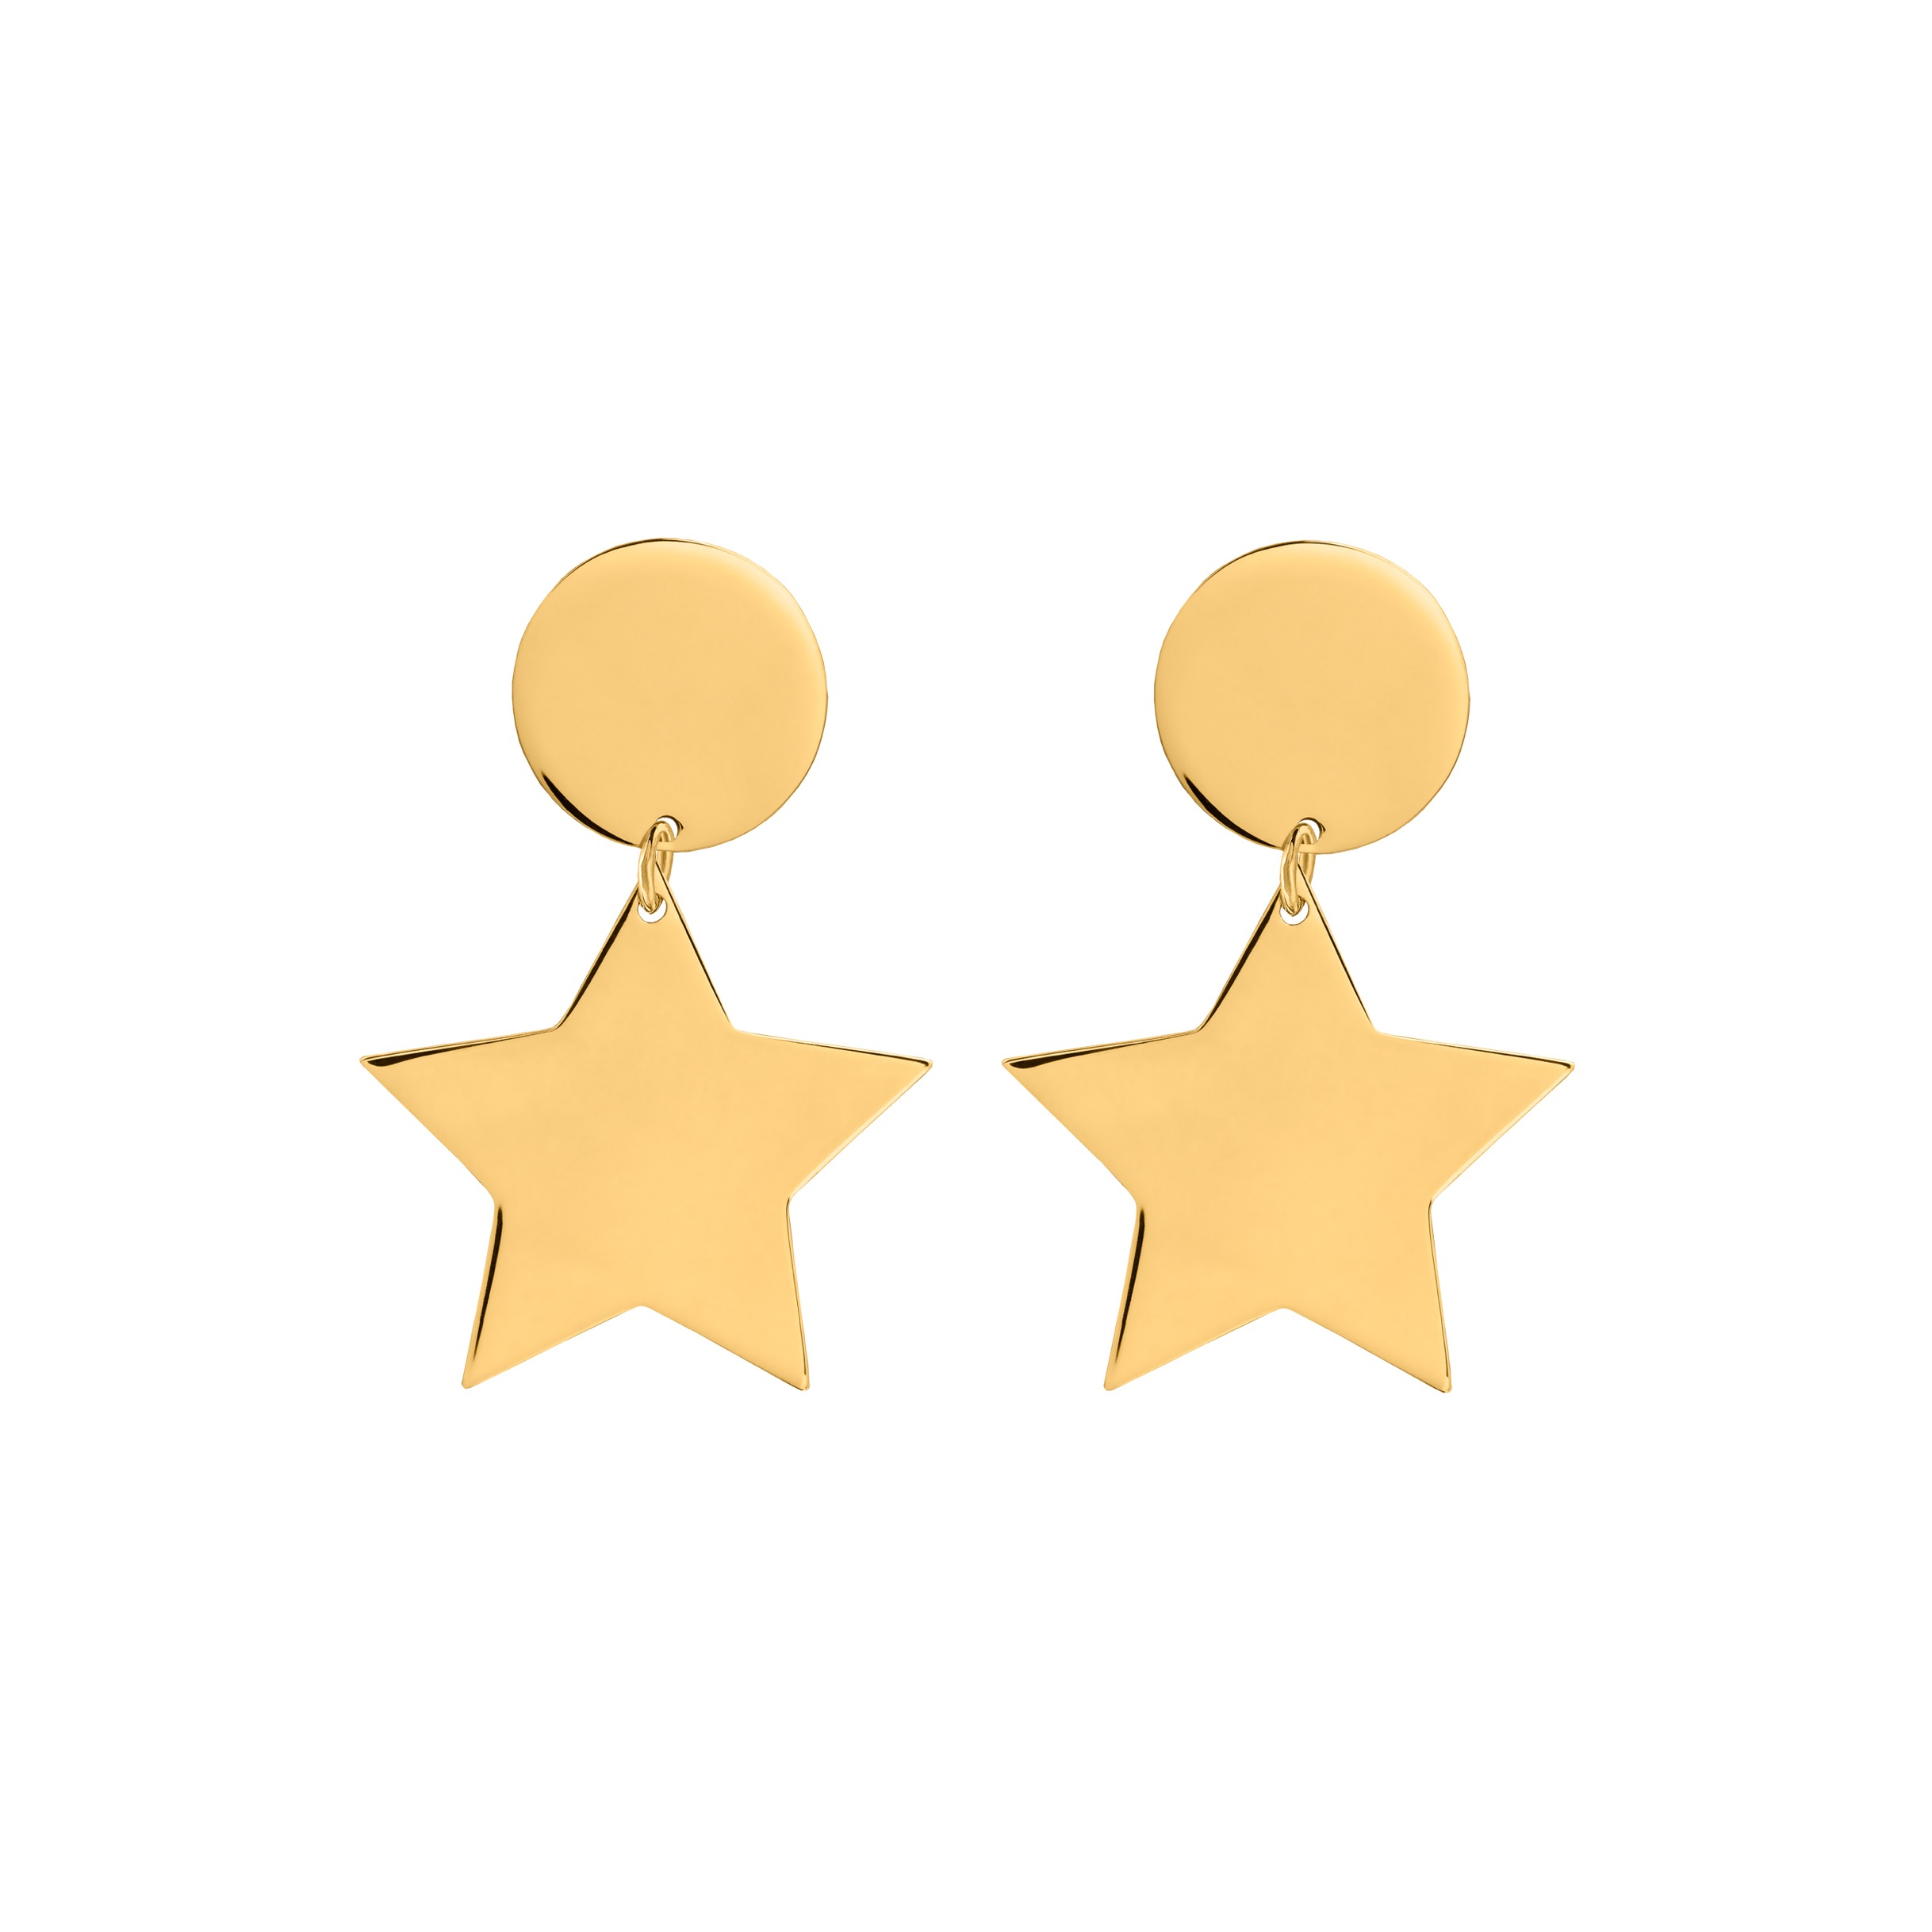 star earrings/ big